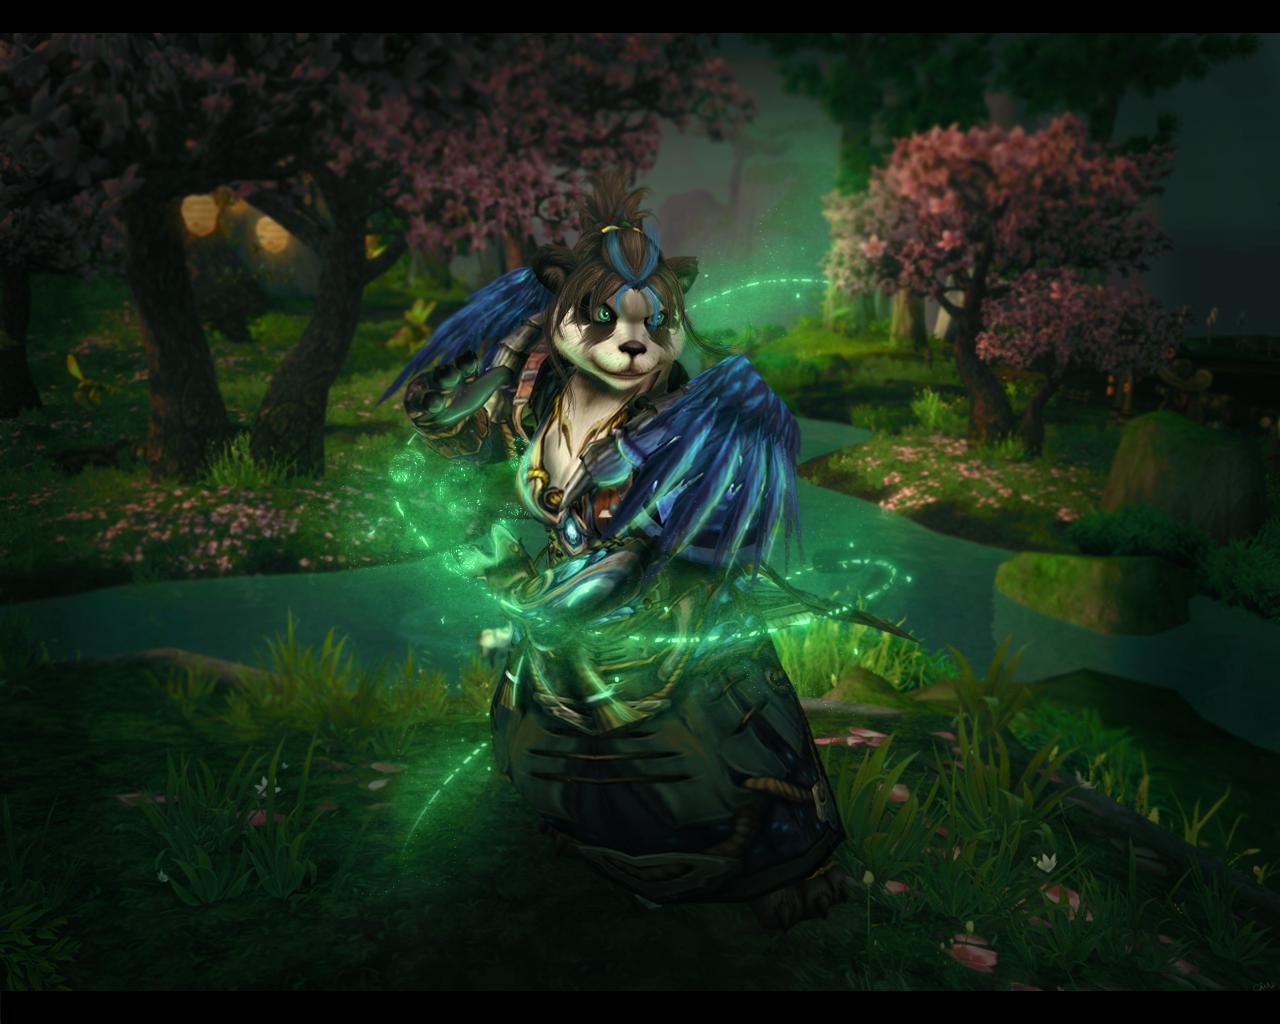 Jungle Wallpaper World Of Warcraft: Panda Monk Wallpaper 2 By Uberkayt On DeviantArt